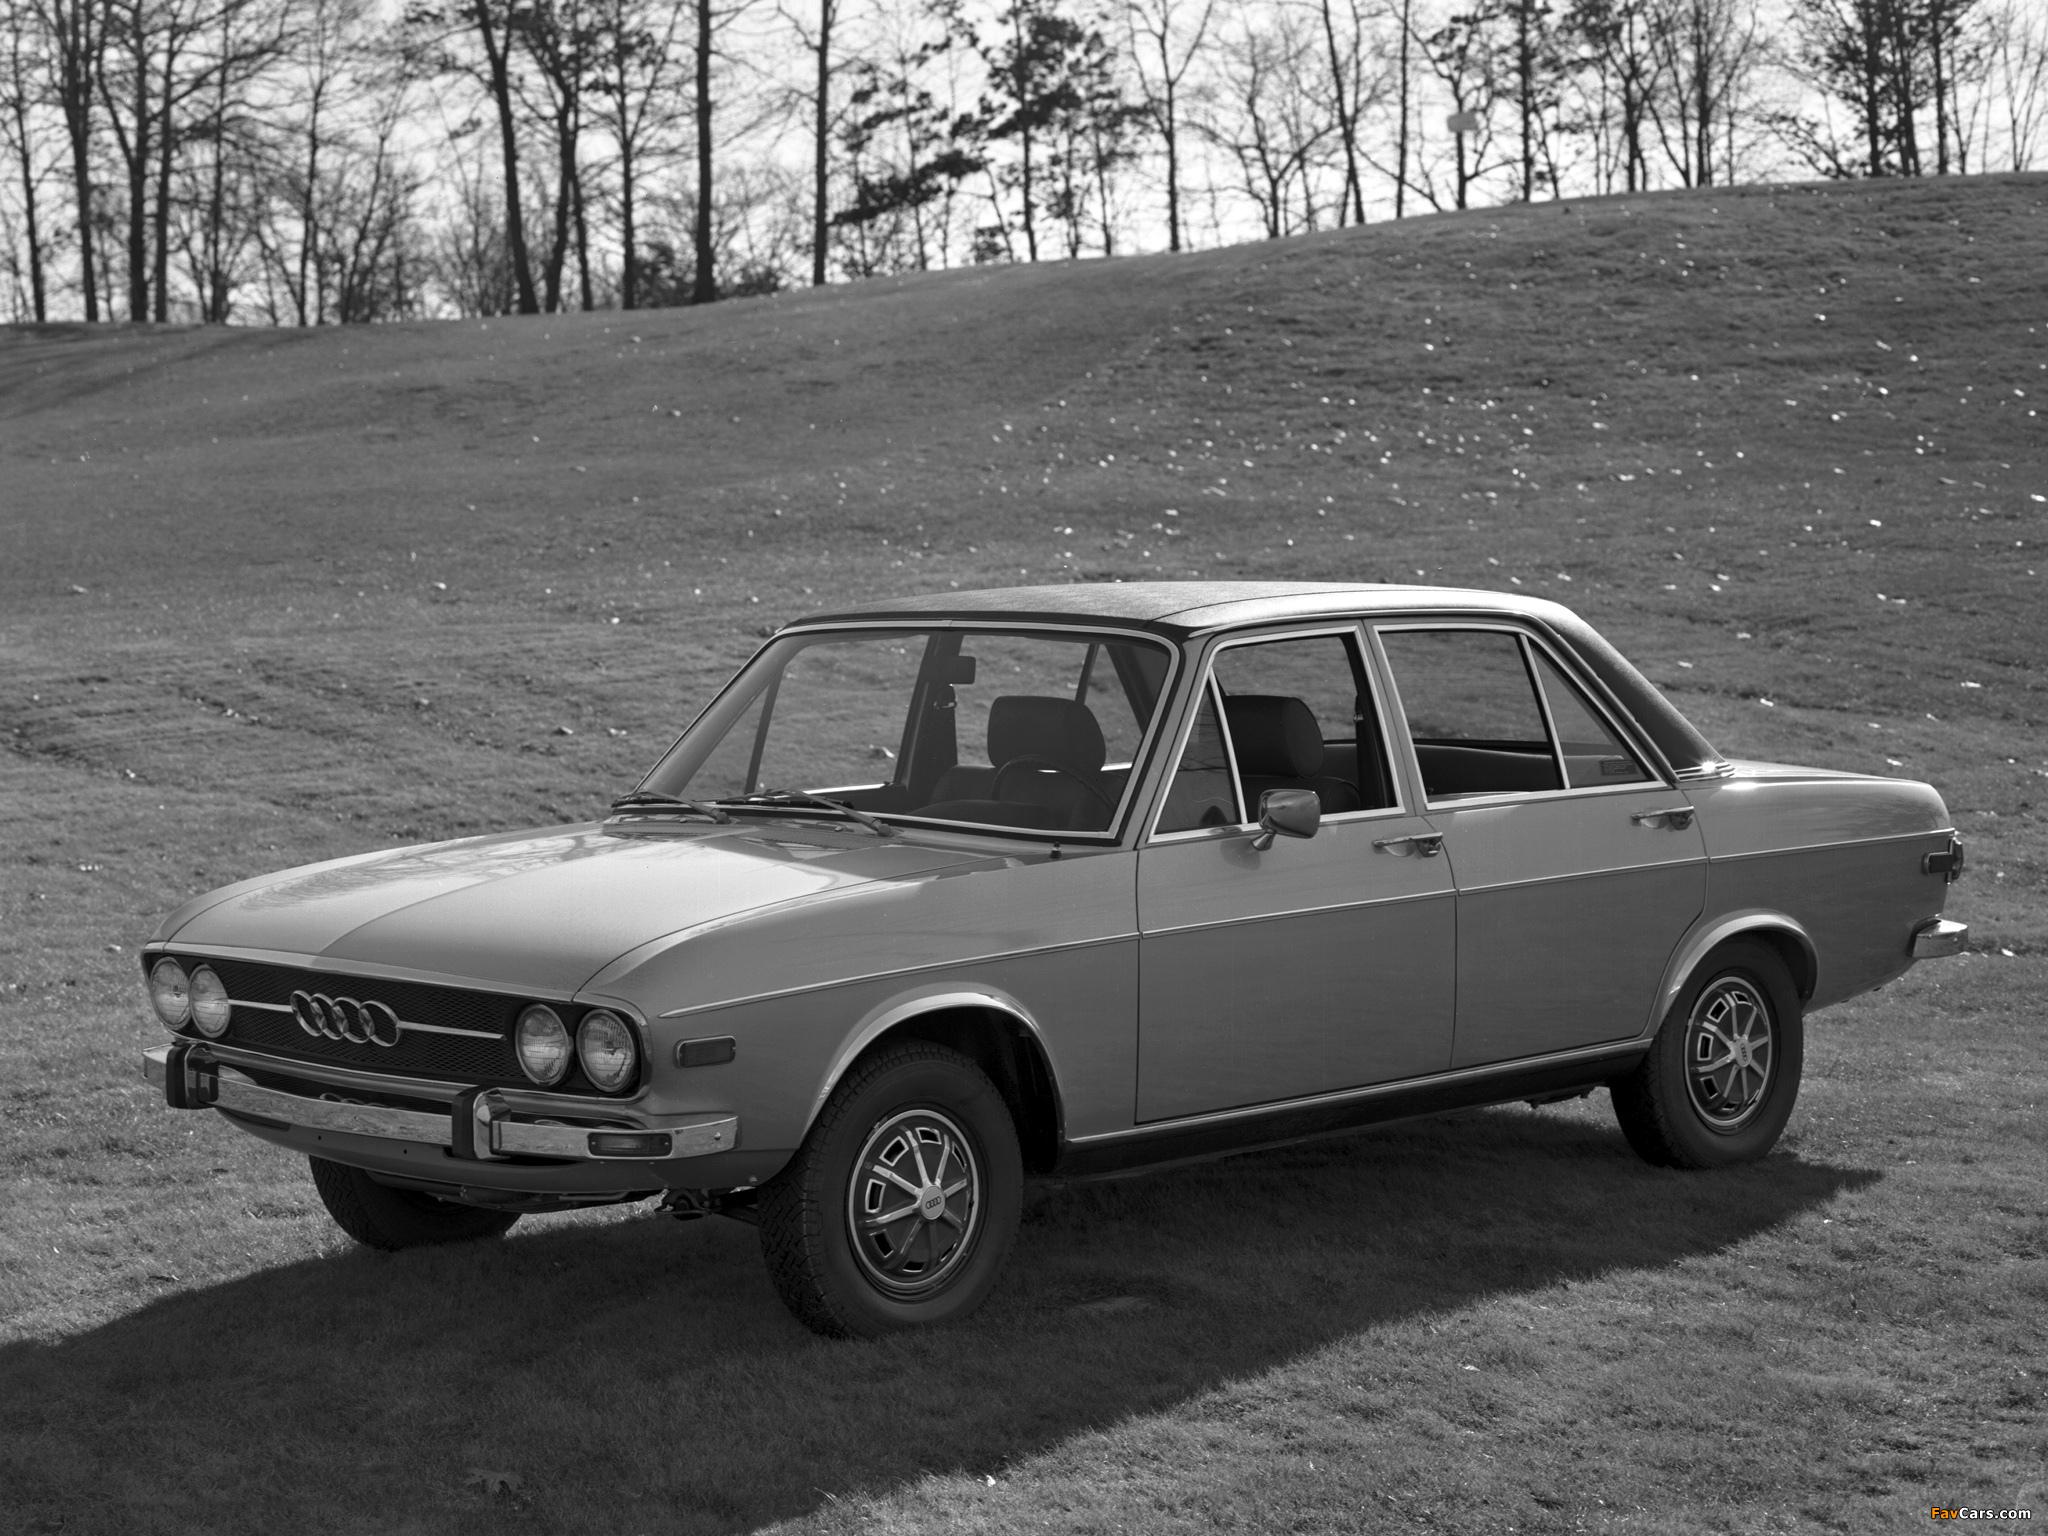 Pictures of Audi 100 GL US-spec C1 (1972–1973) (2048x1536) on the new audi, first audi, blue audi, exotic audi, pink audi, chief keef audi, white audi, all black audi, golden audi, fast audi, cheap audi, matchbox audi,